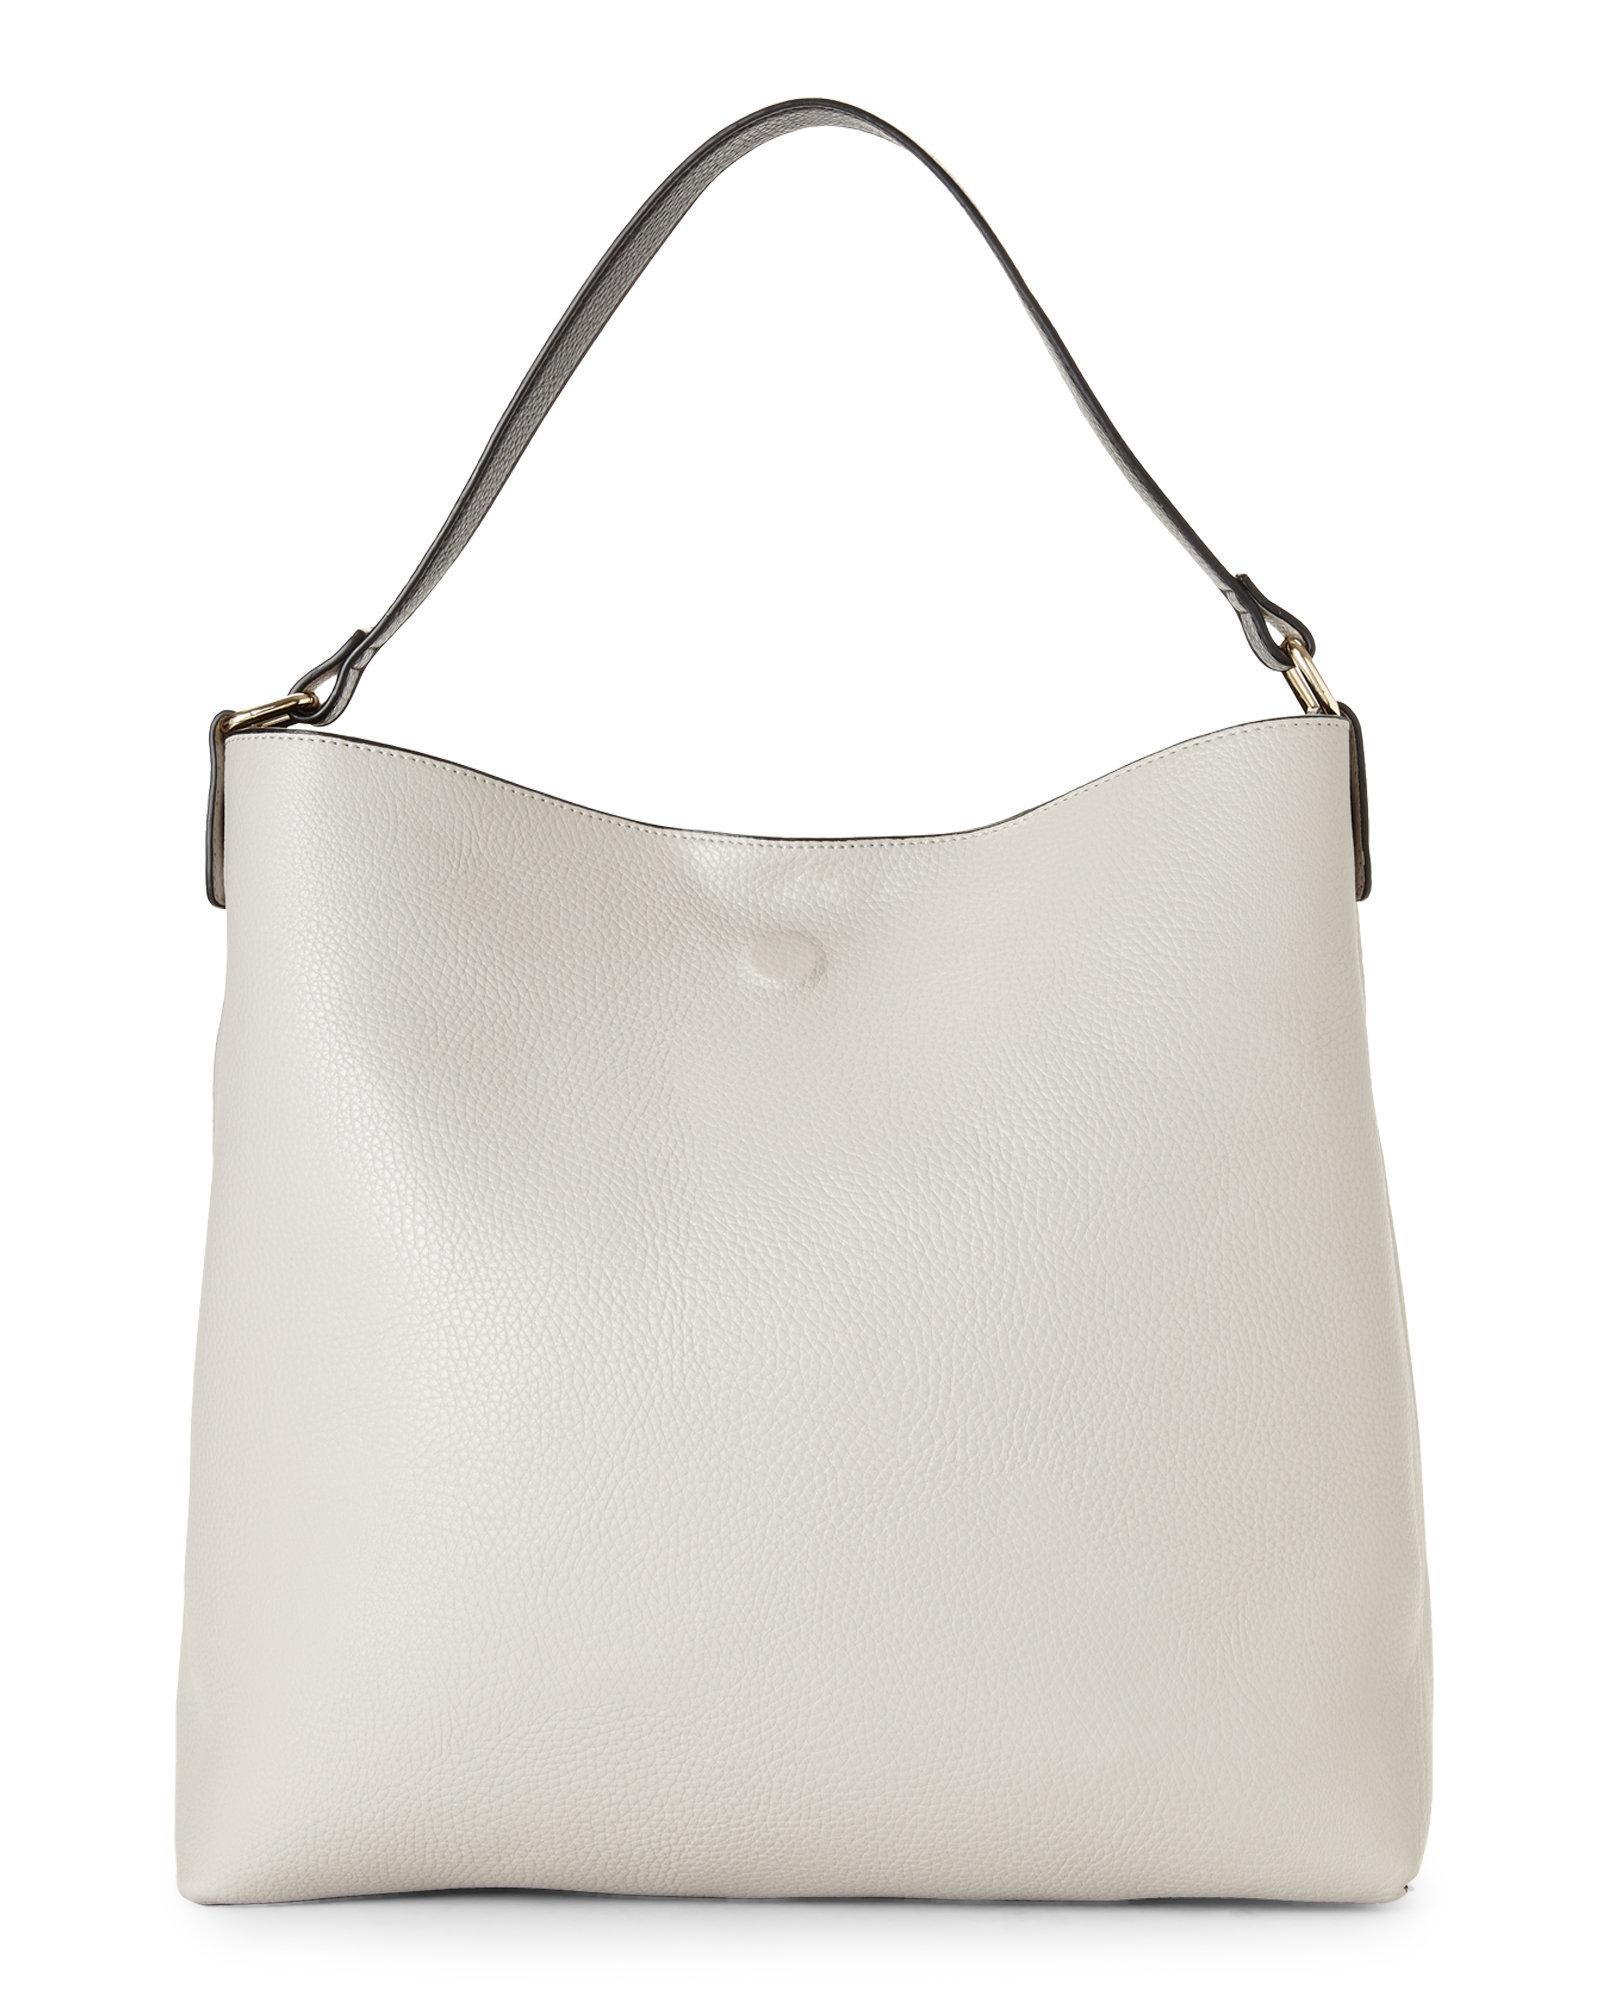 Amazoncom : Reversible Hobo Bag - The Avenue :